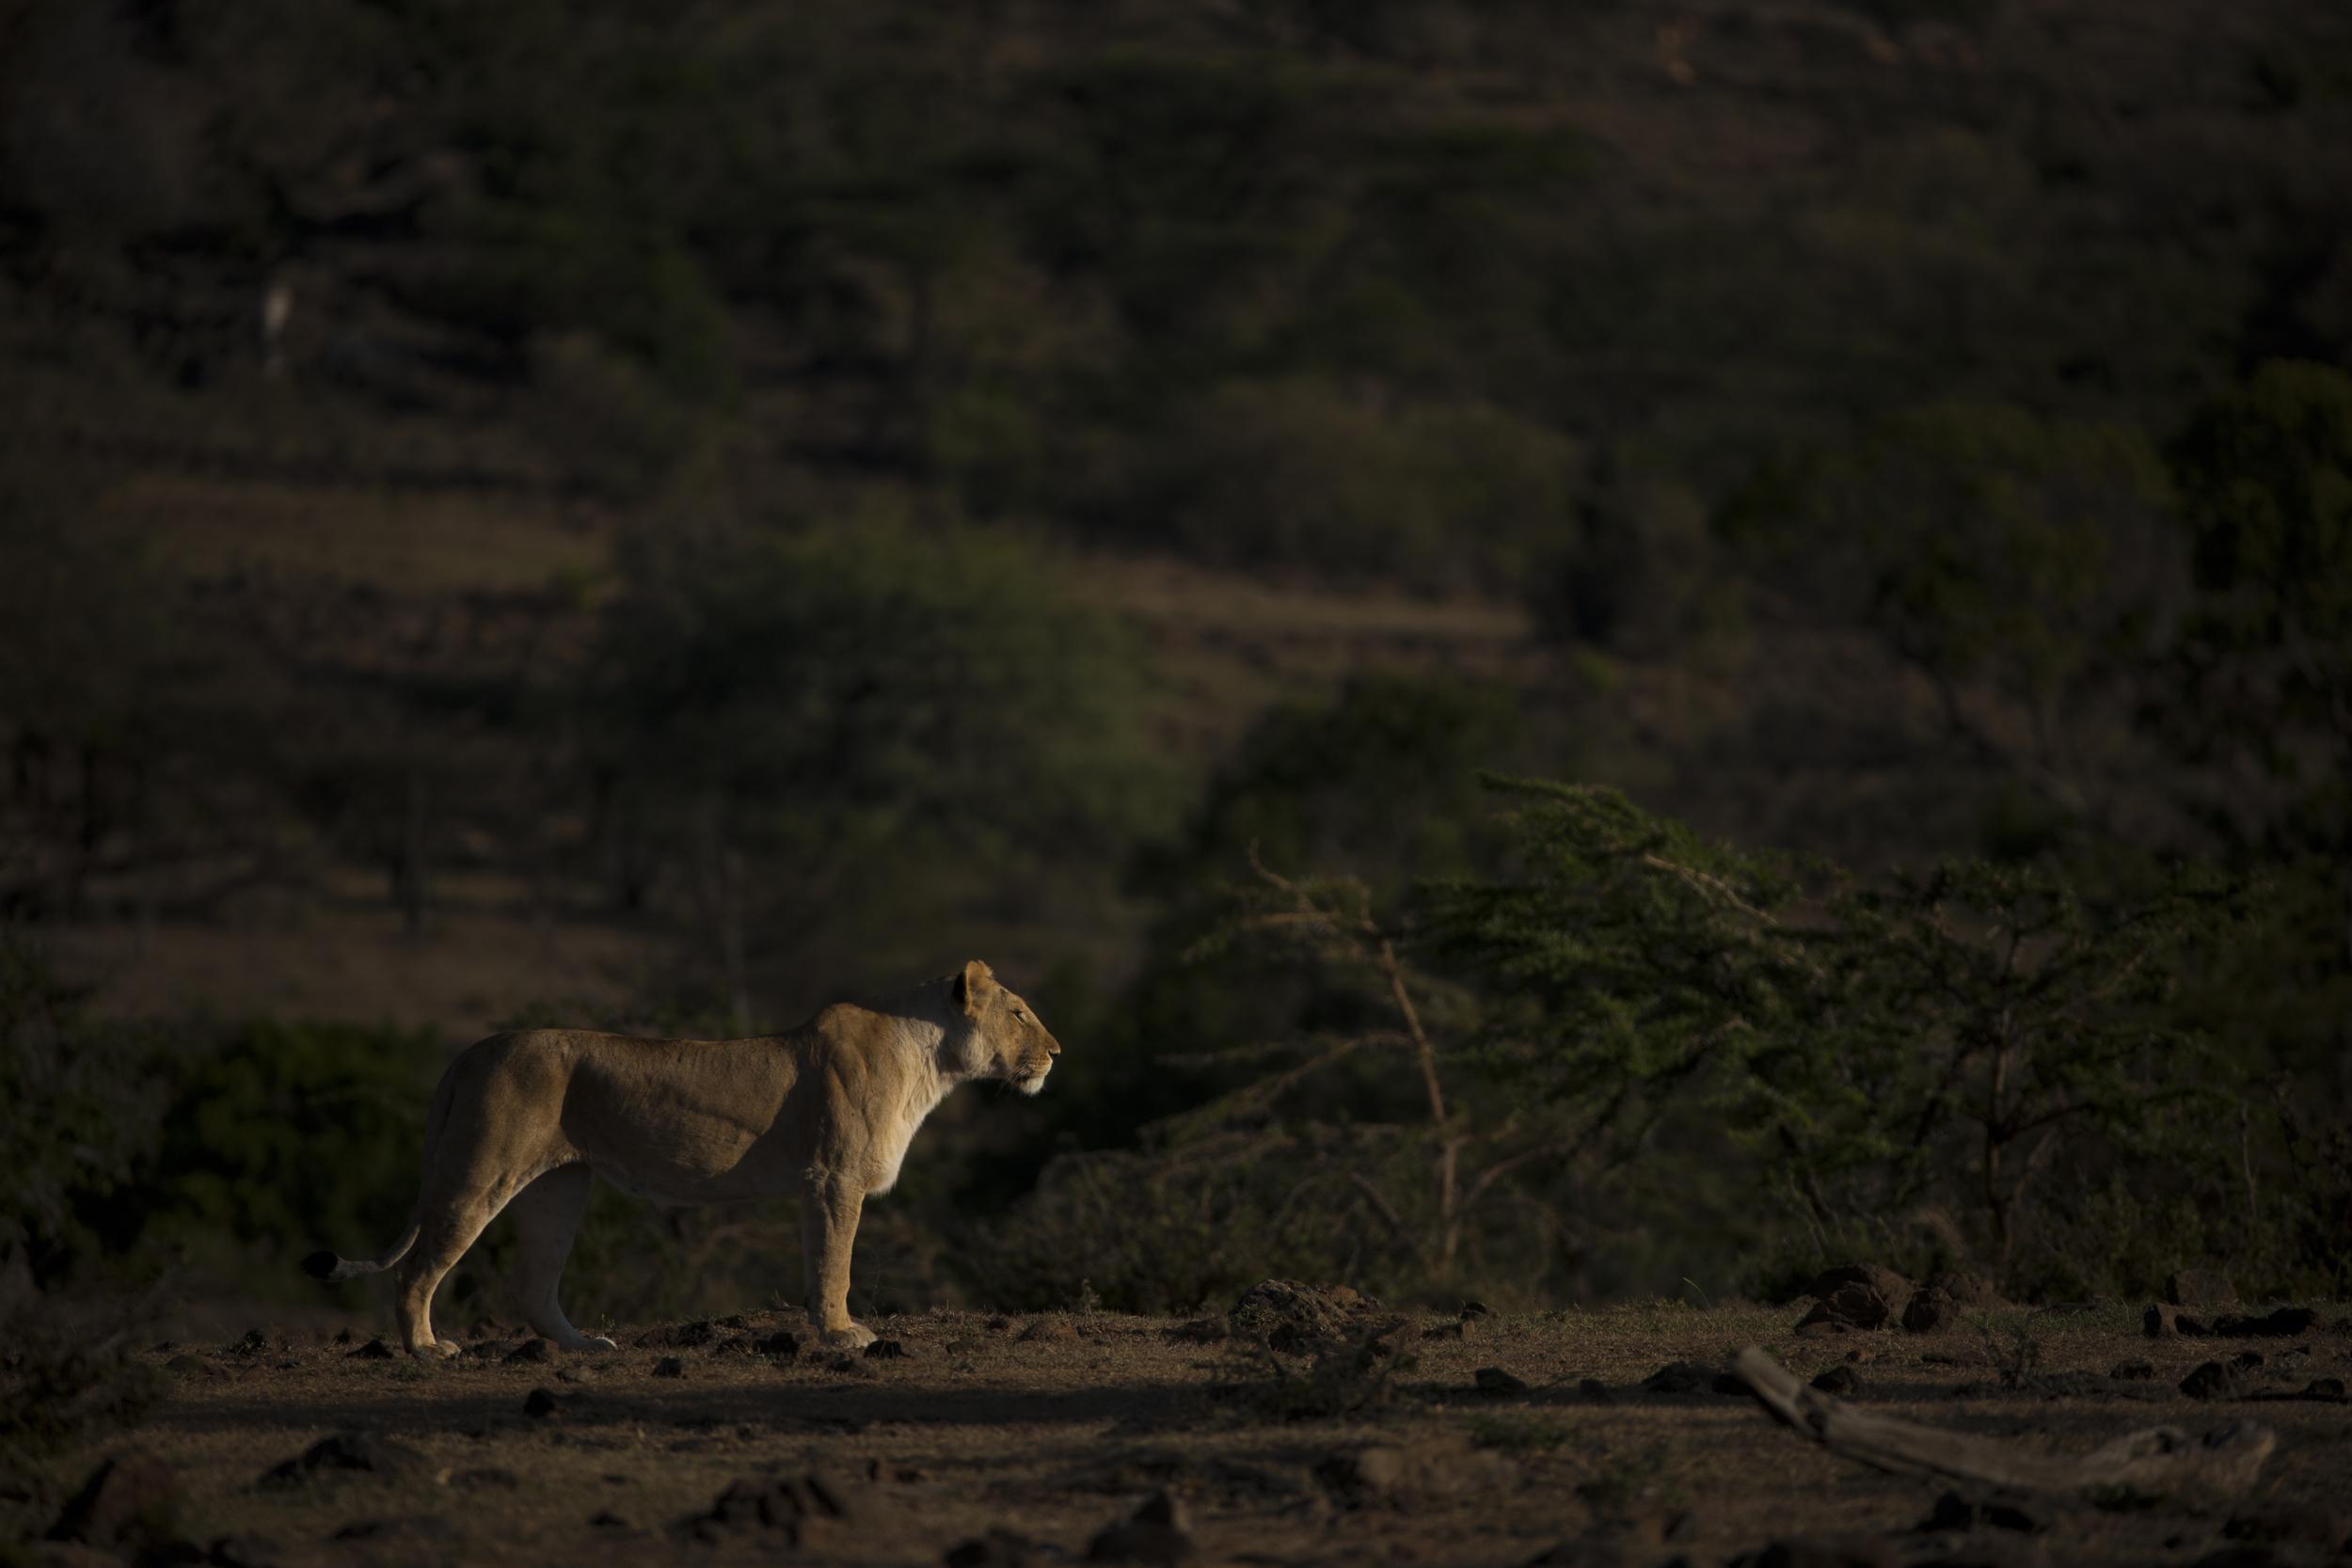 Mara Plains_Kenya_2014_Beverly Joubert20141216_3247.jpg